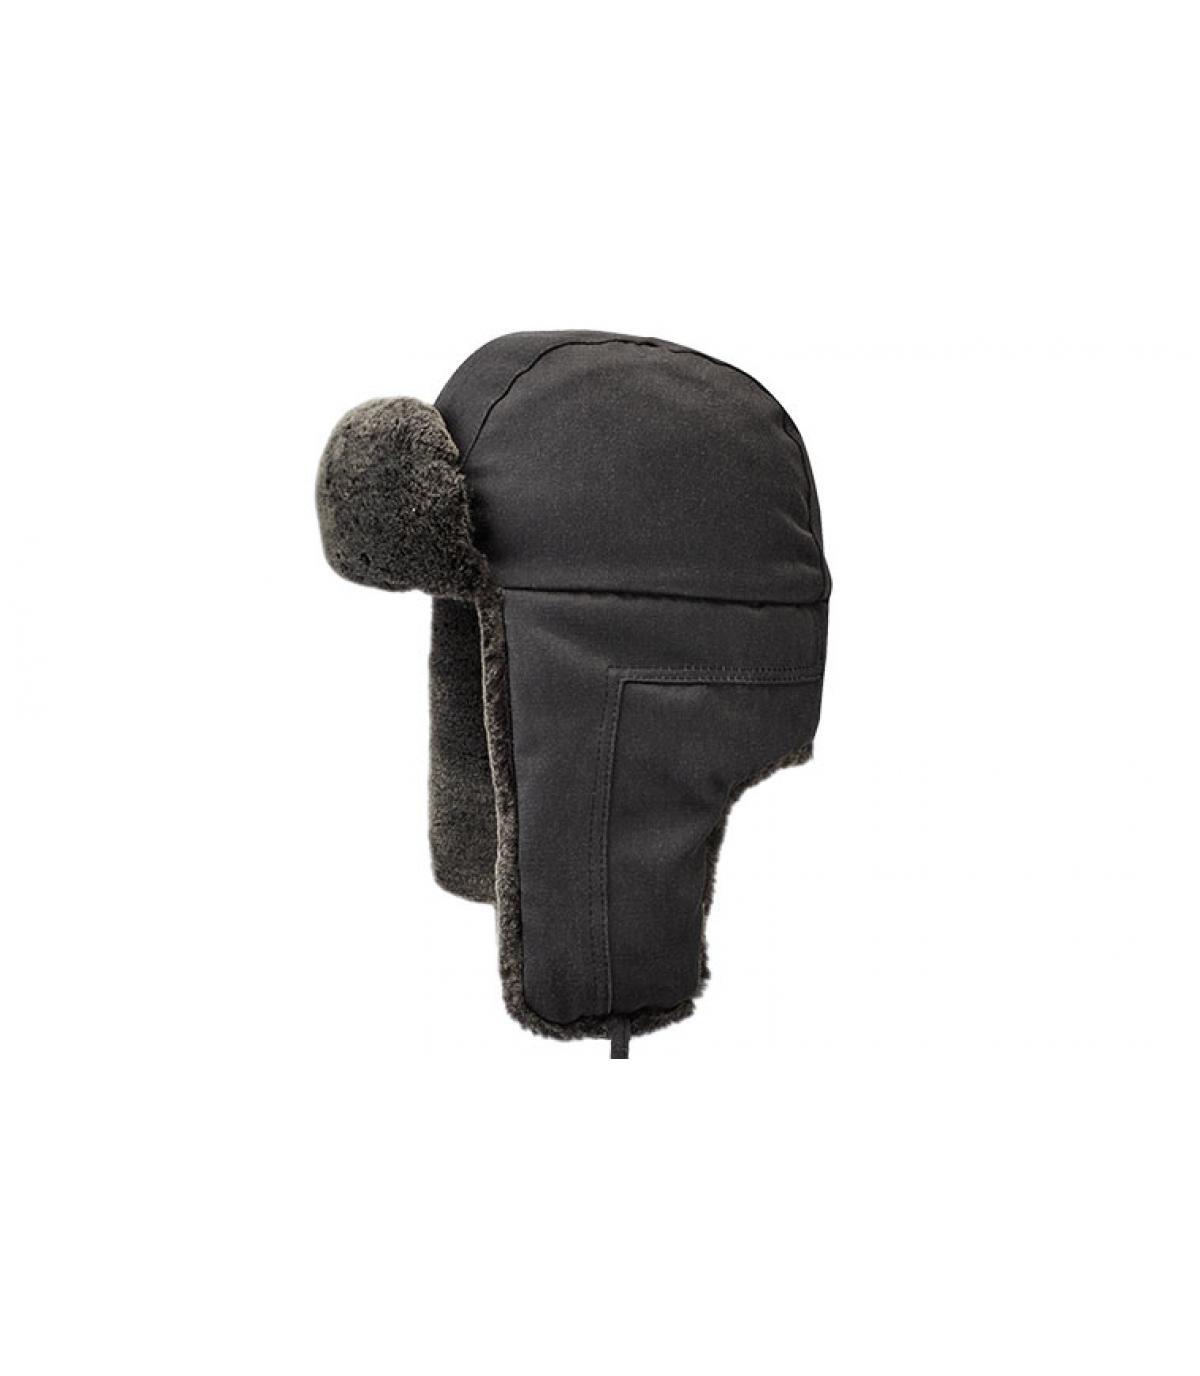 Details Bomber Cap CO PE Fake Fur black - Abbildung 2